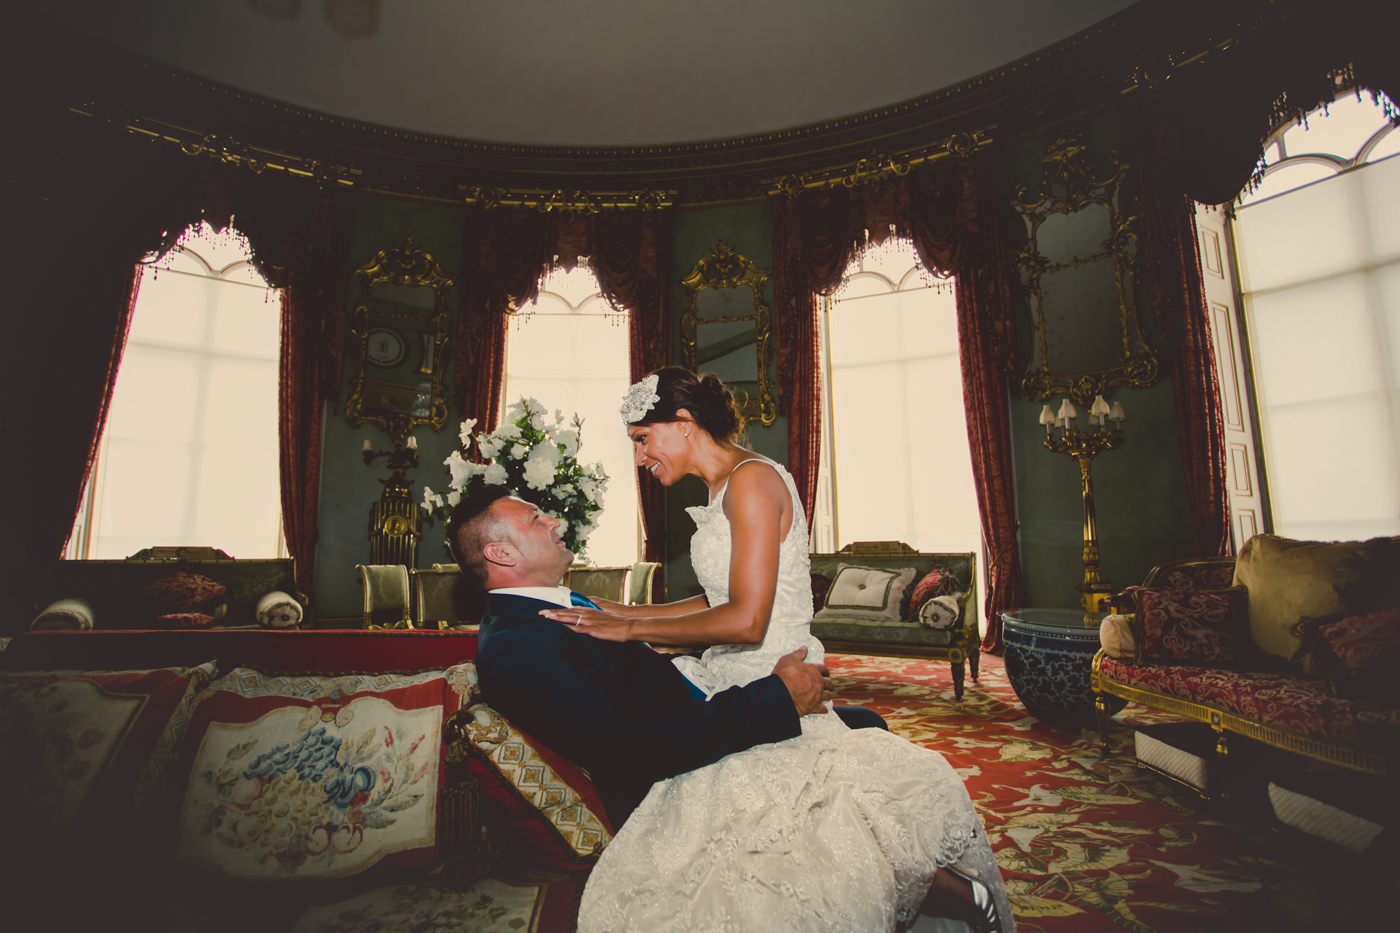 113 Donna and John Wedding Photography at Belvoir Castle www.belvoircastle.com UK by Mark Pugh.JPG